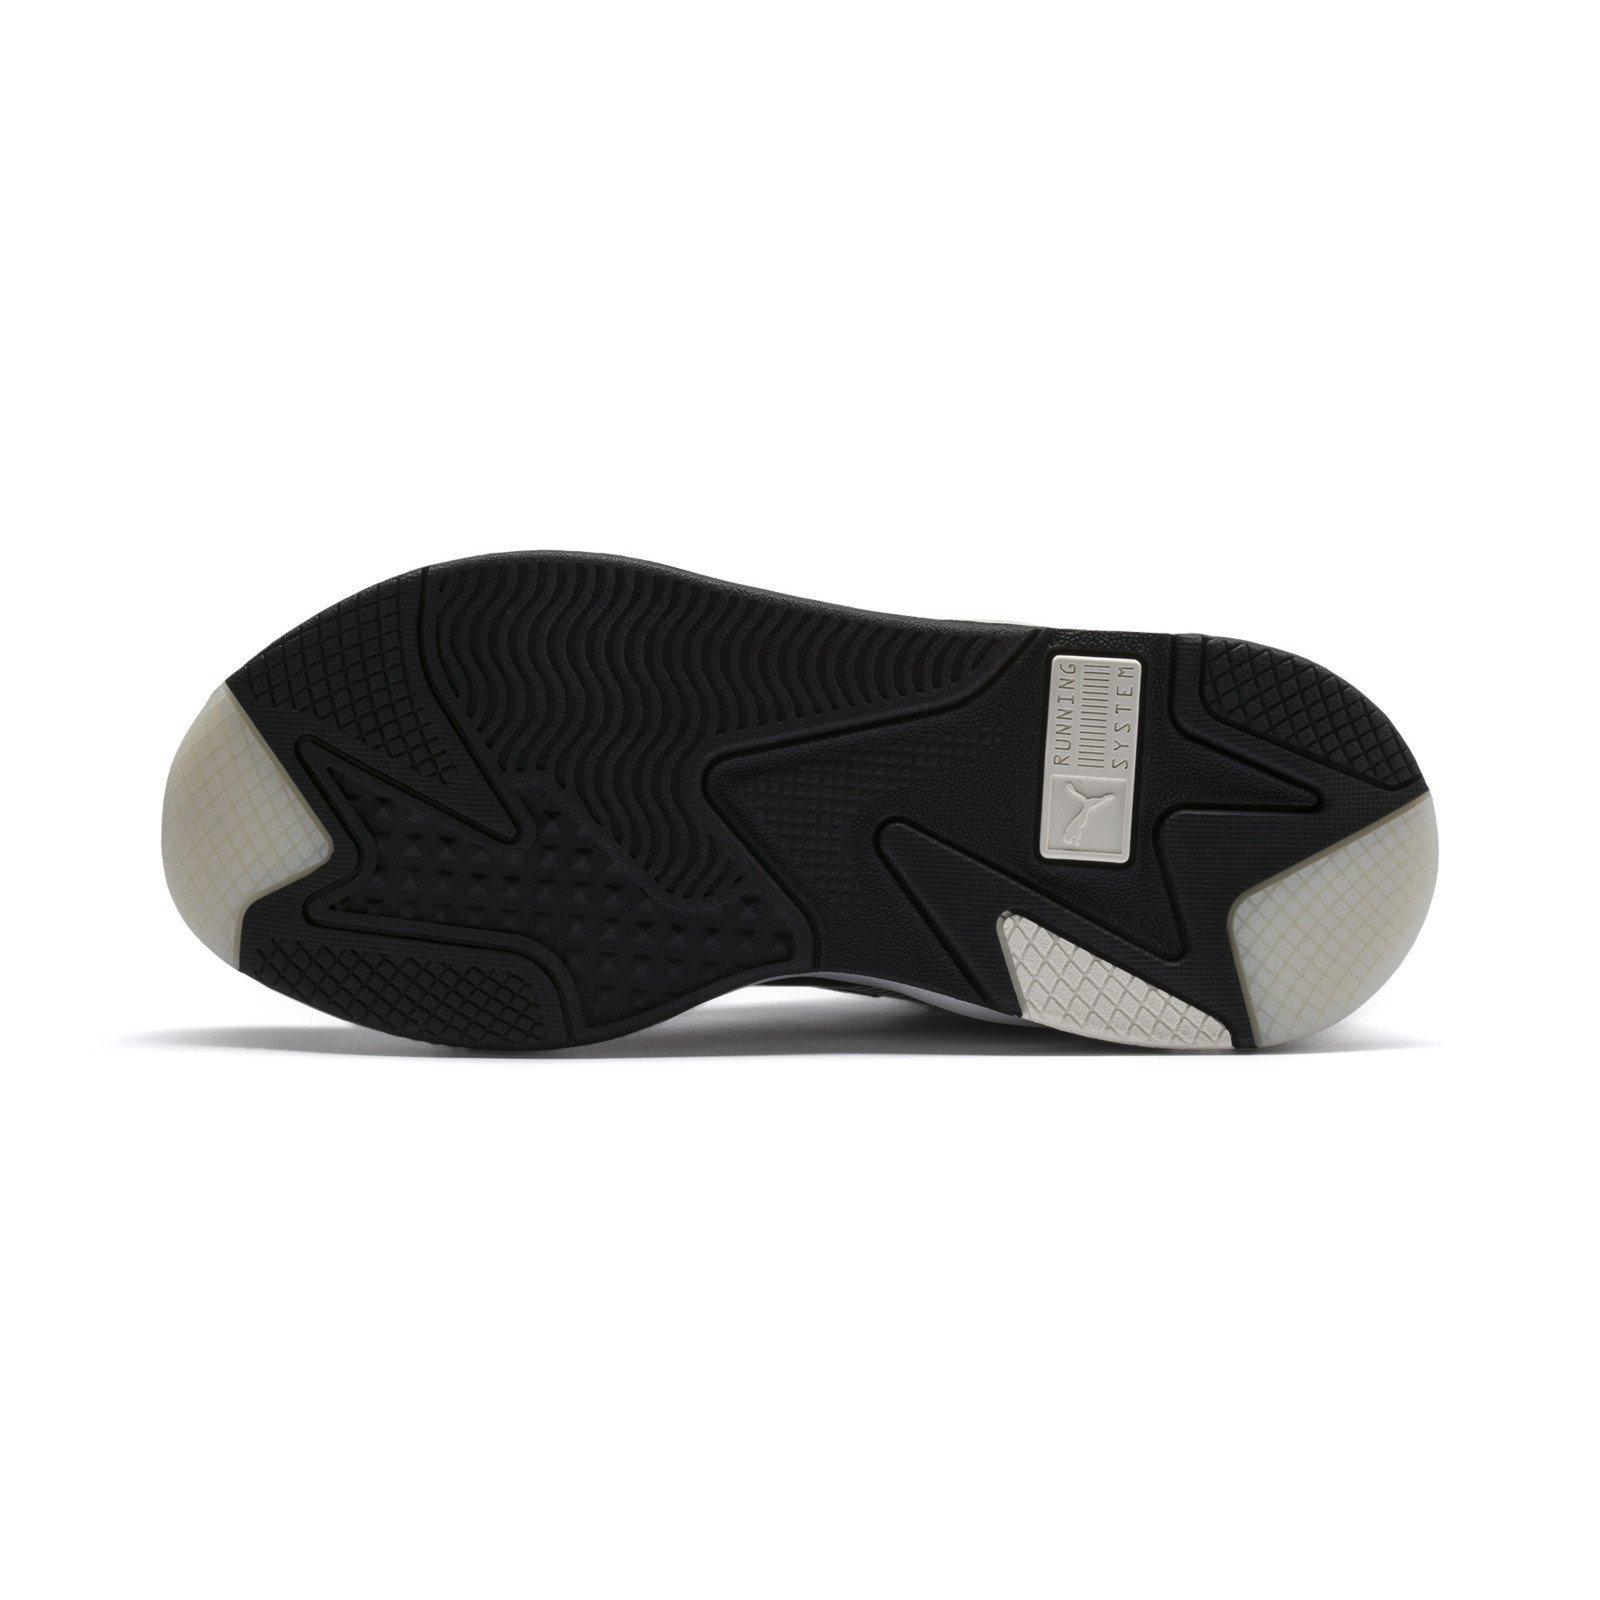 Puma RS-X Tech 'Black & White' (369329-01)